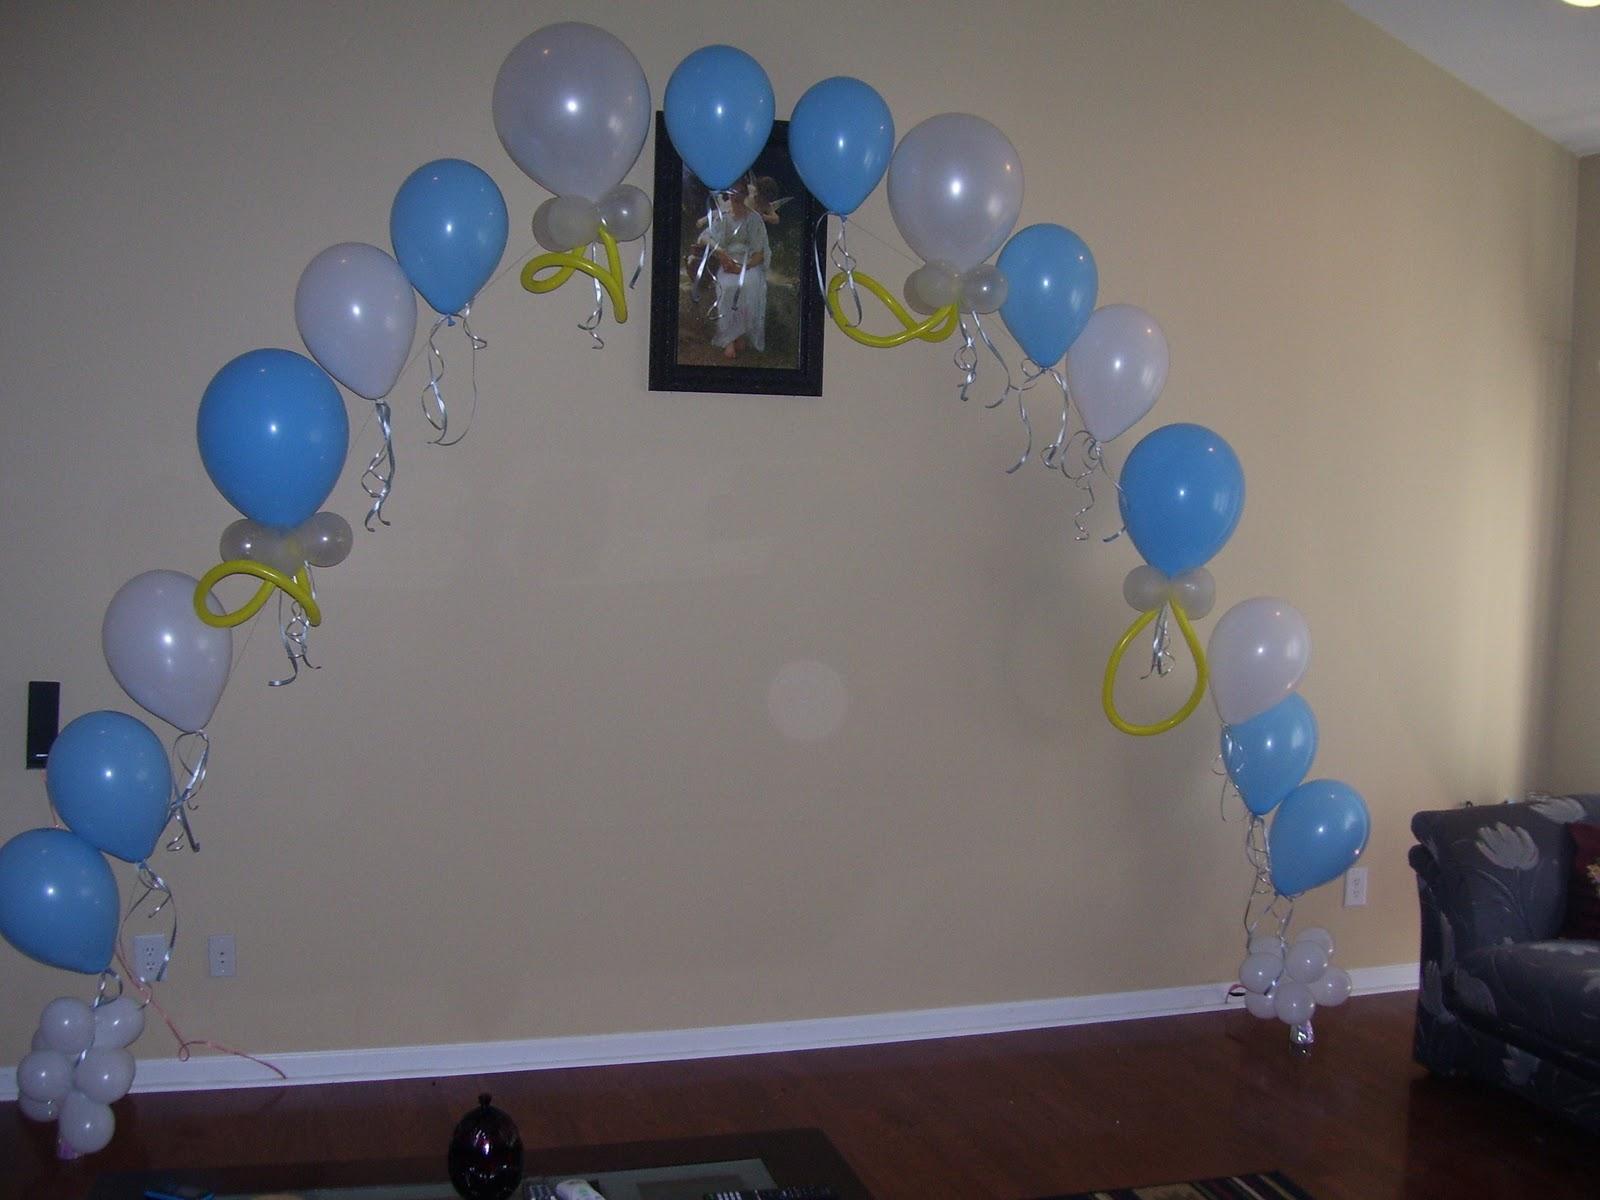 Professional Balloon Decoration Services Dubai